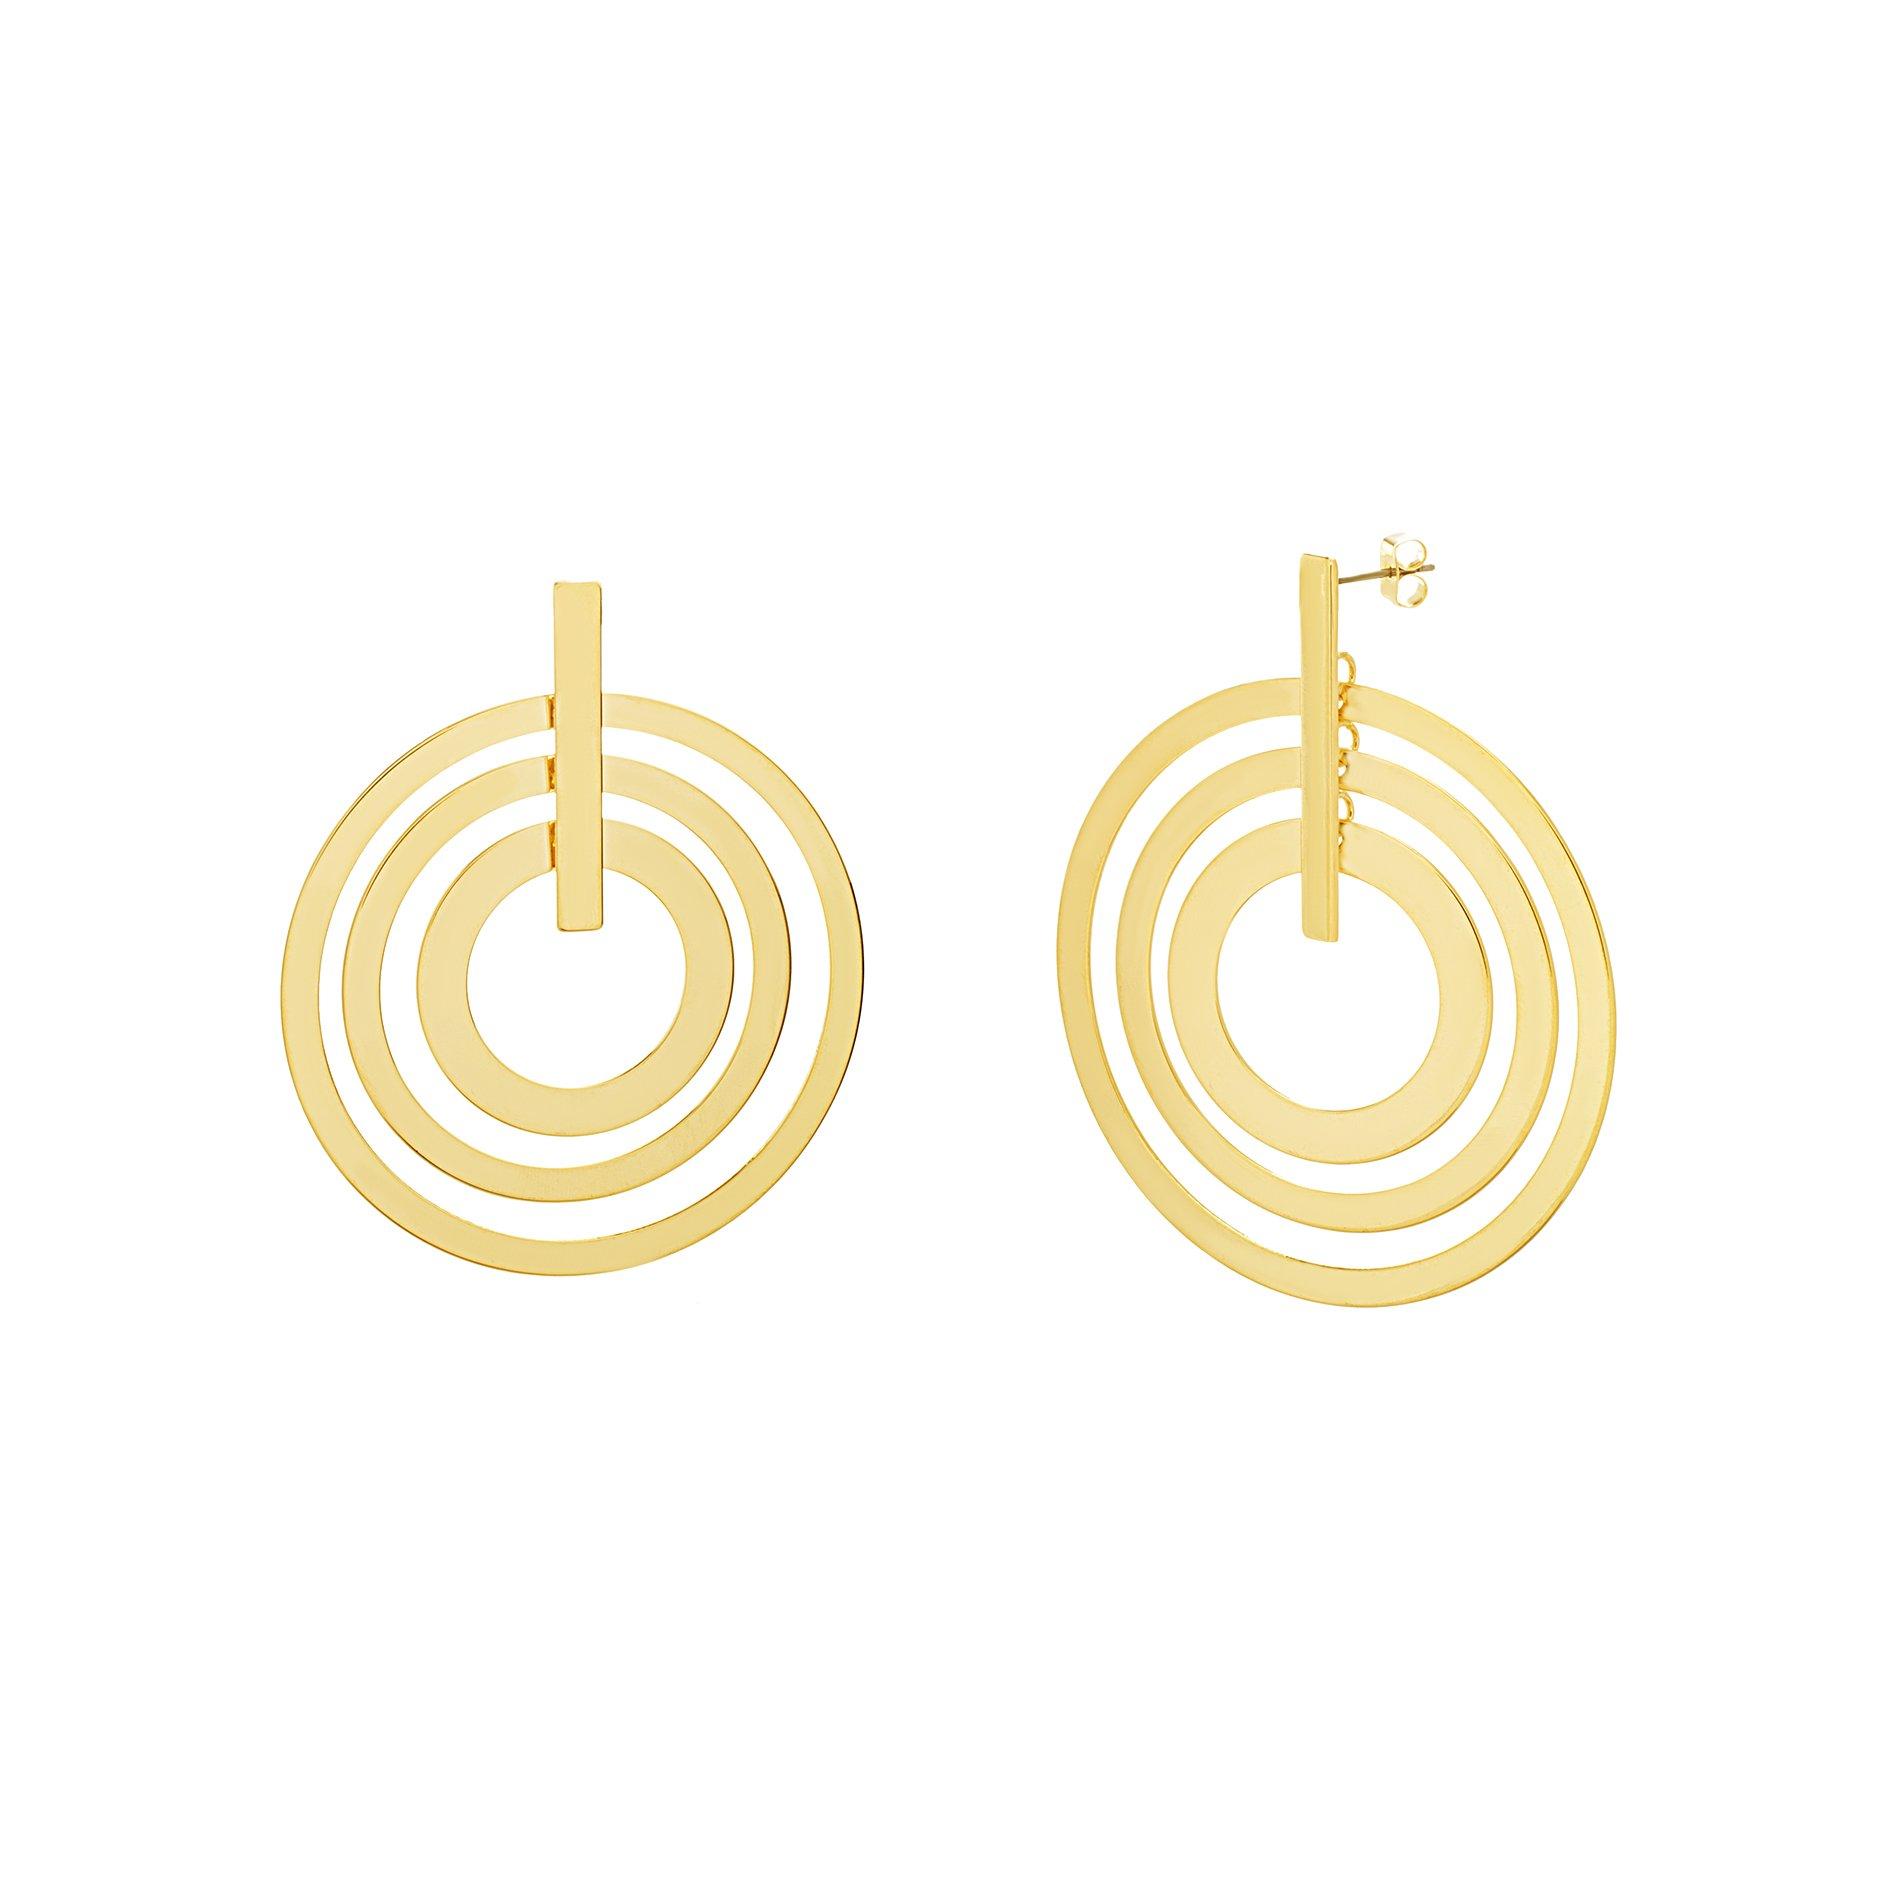 Catherine Malandrino Women's Polished Layered Circle and Bar Circle Yellow Gold-Tone Earrings (Yellow)